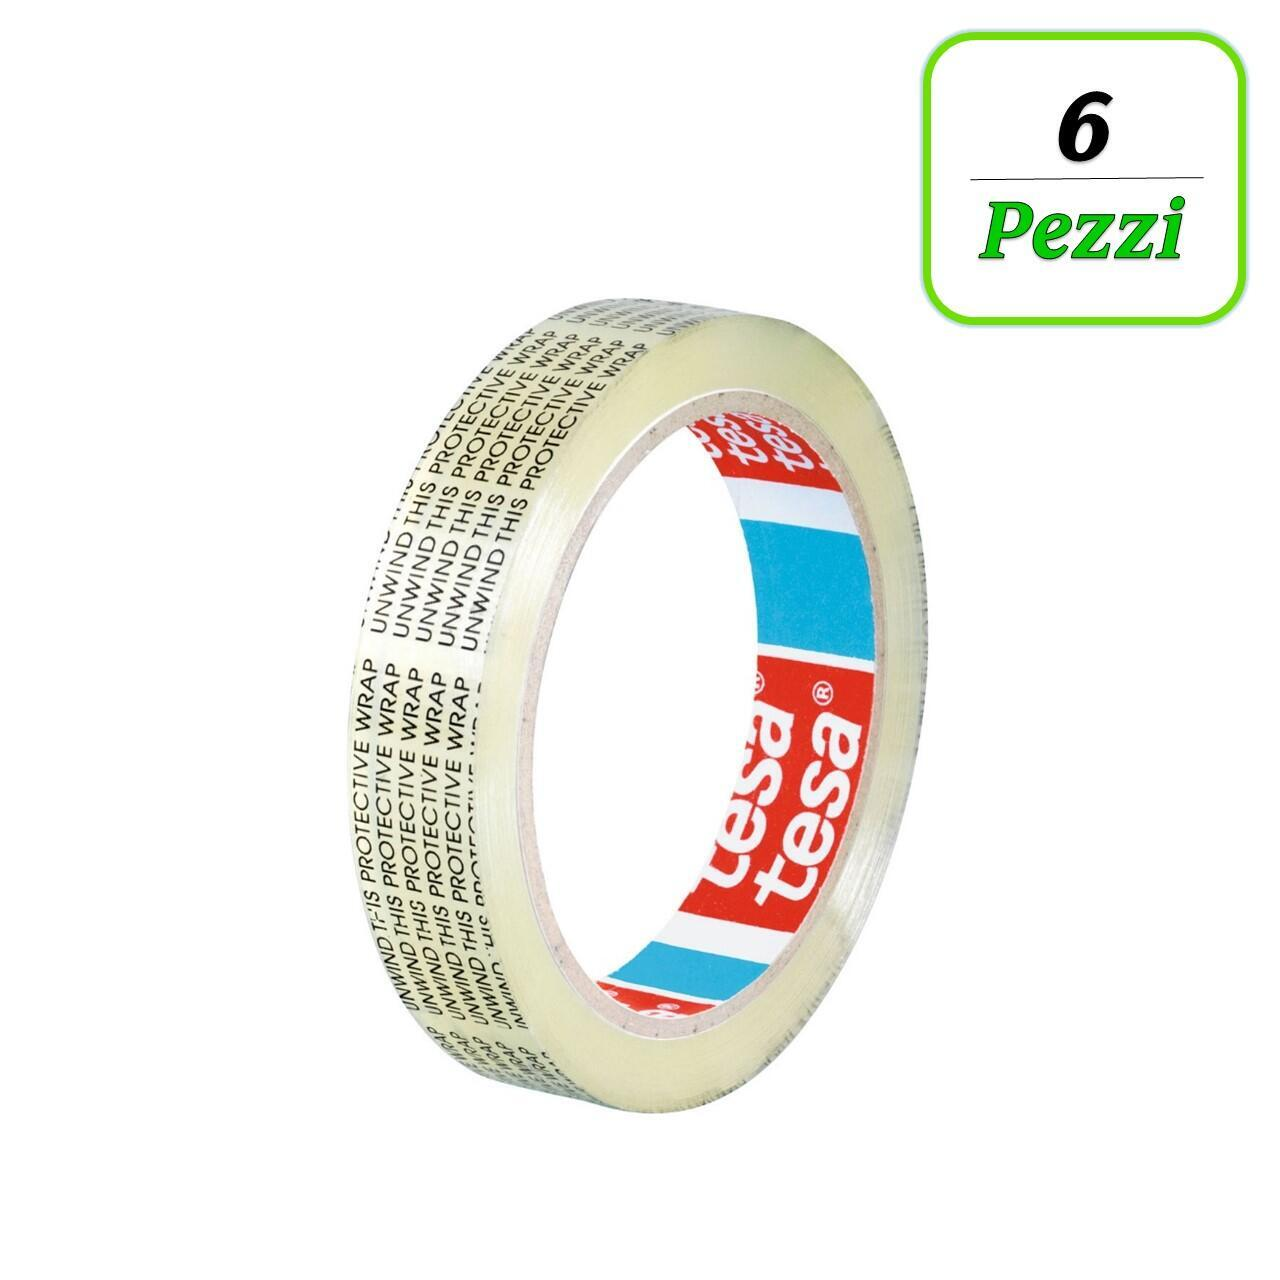 Nastro bi-adesivo TESA tesafilm® Biadesivo 33 m x 19 mm trasparente - 1